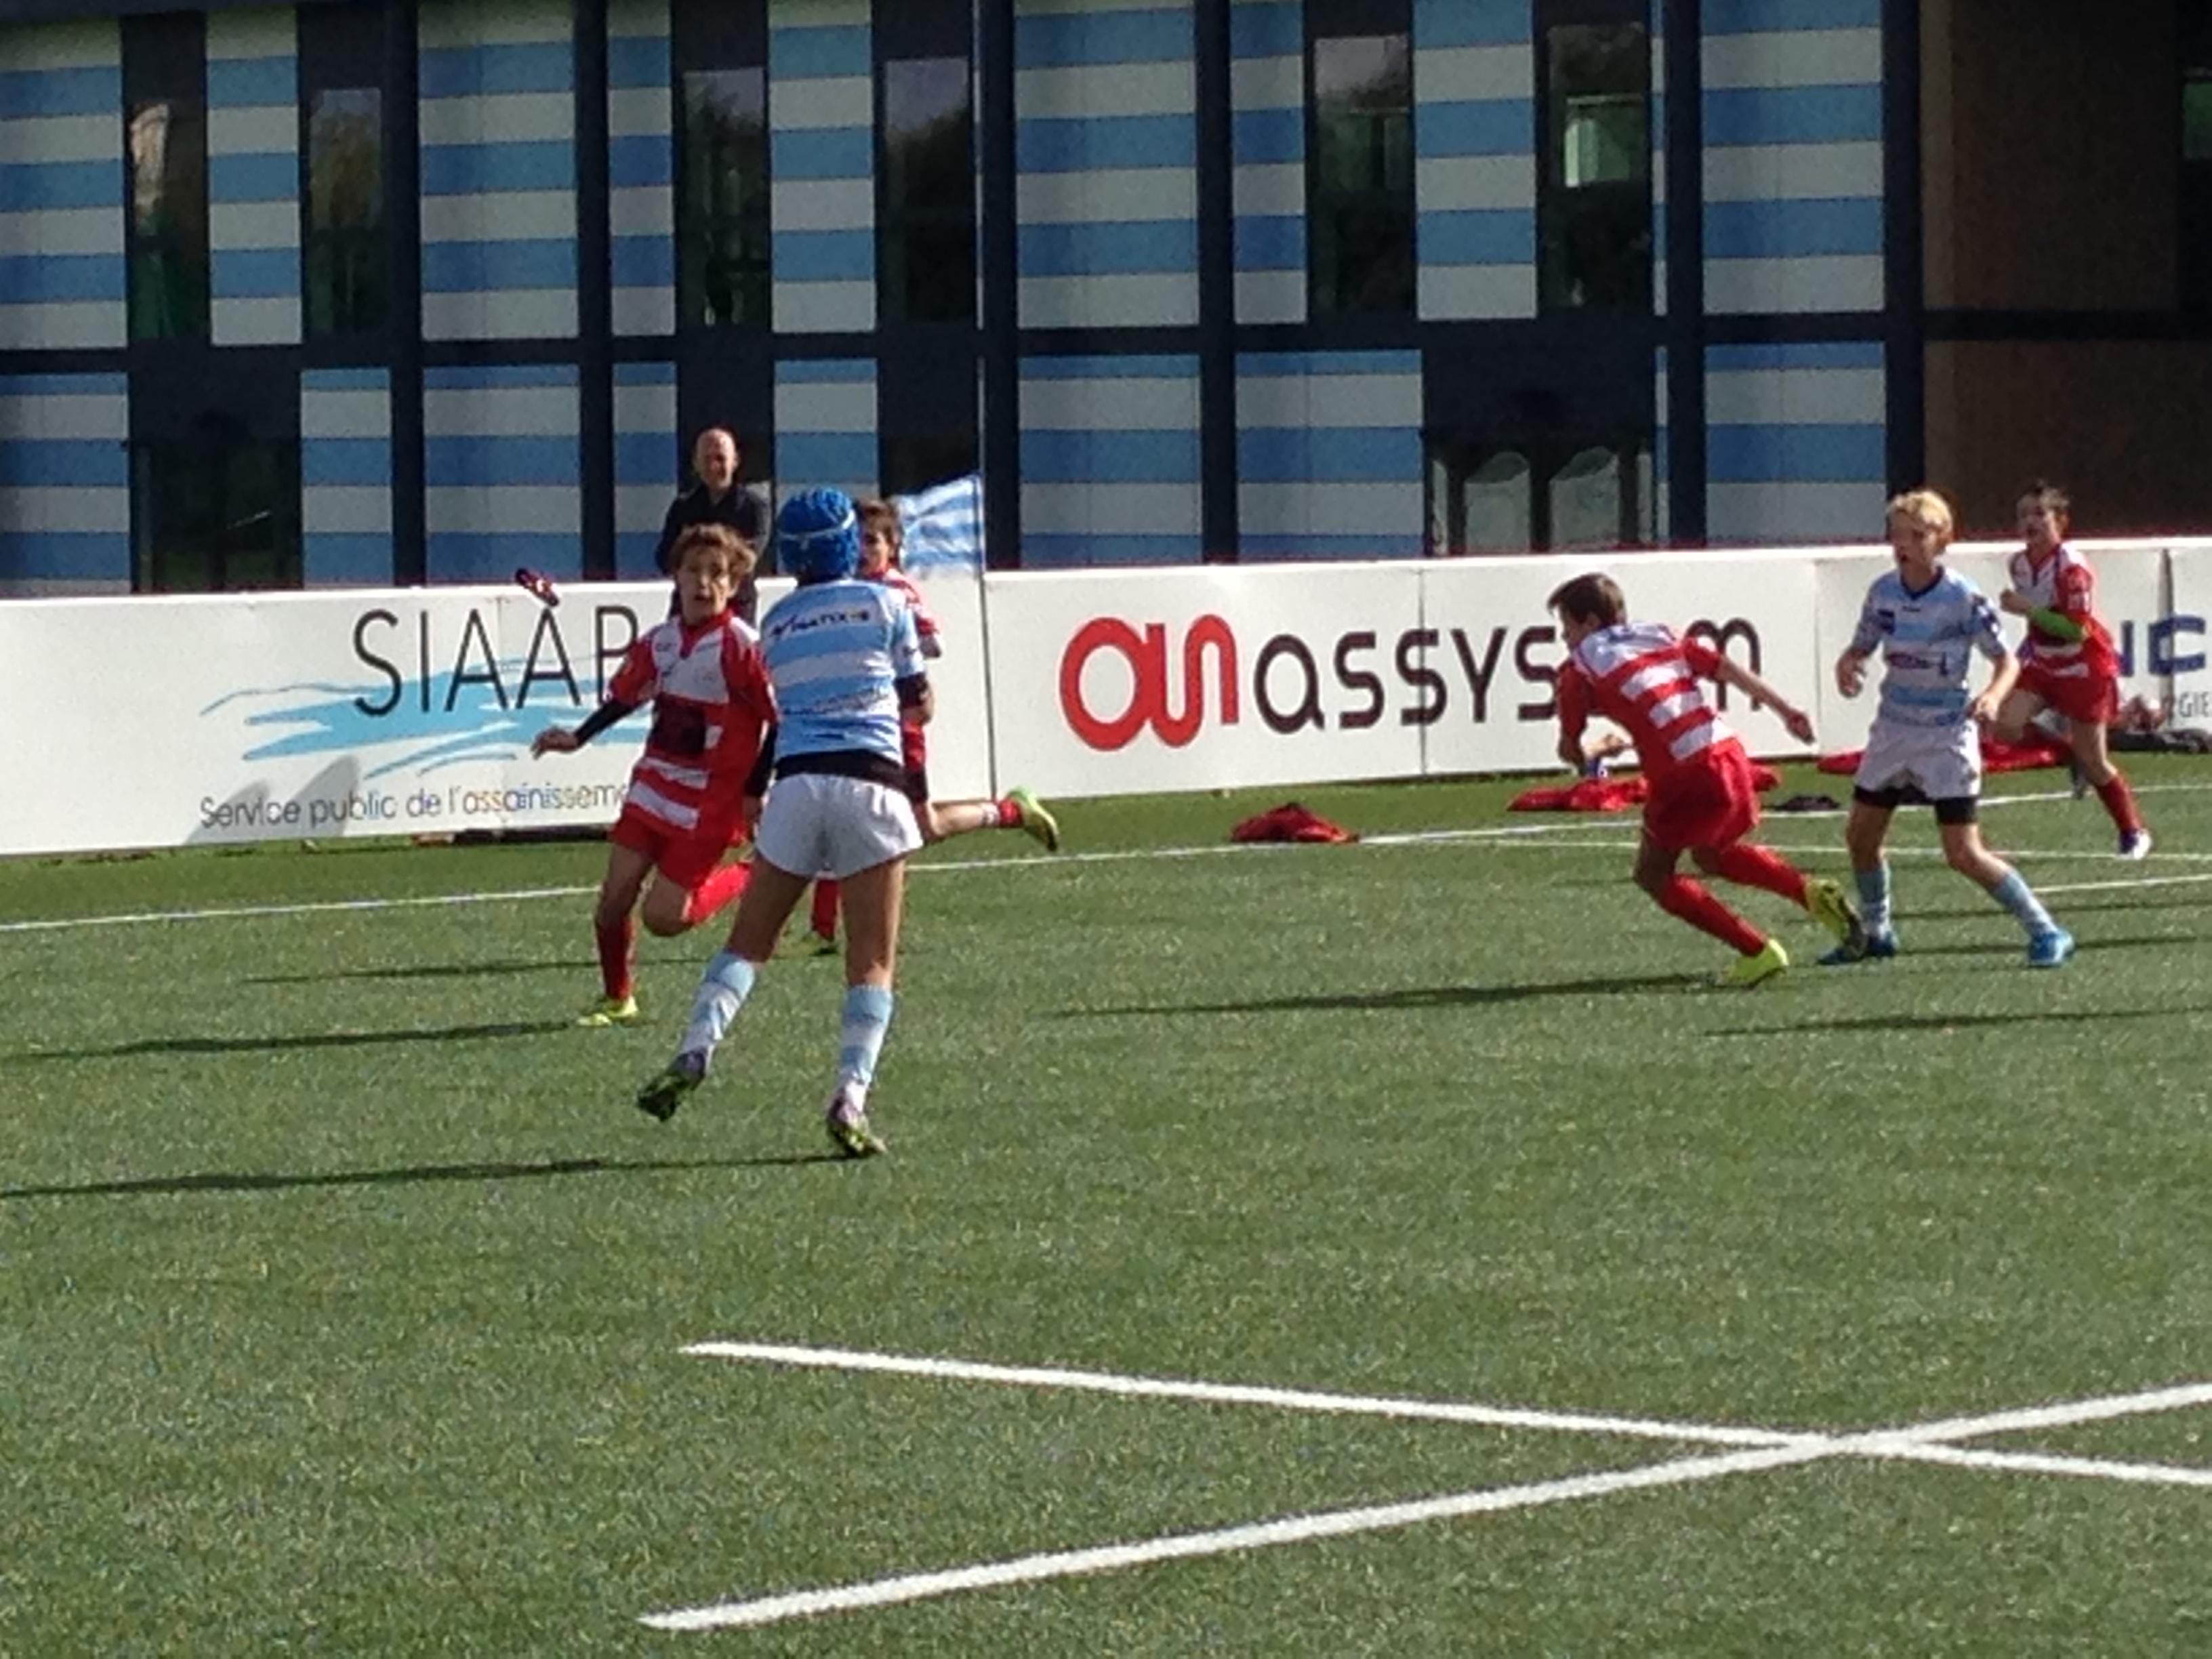 premieres rencontres u14 clamart rugby 92 équipe 2004